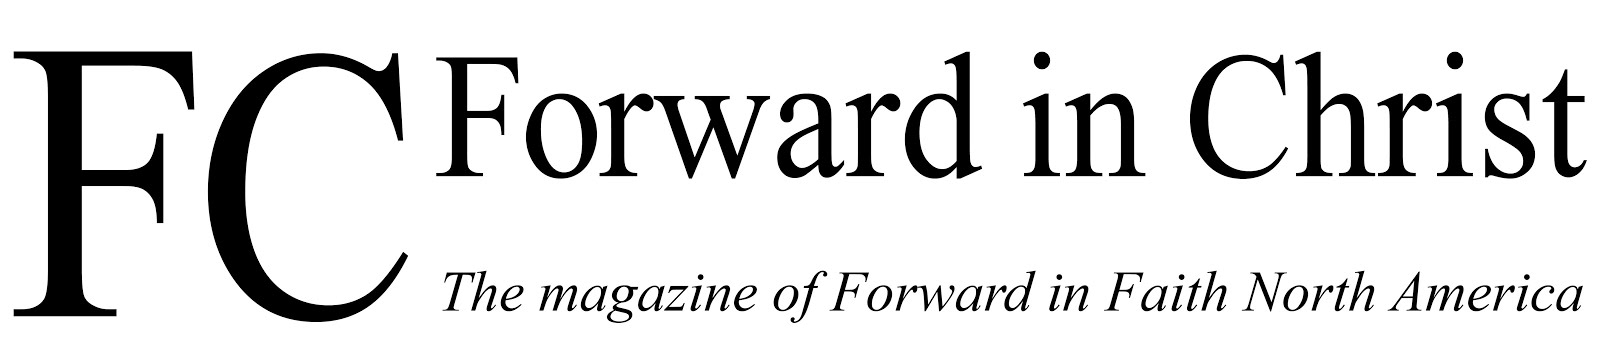 Forward in Christ Magazine